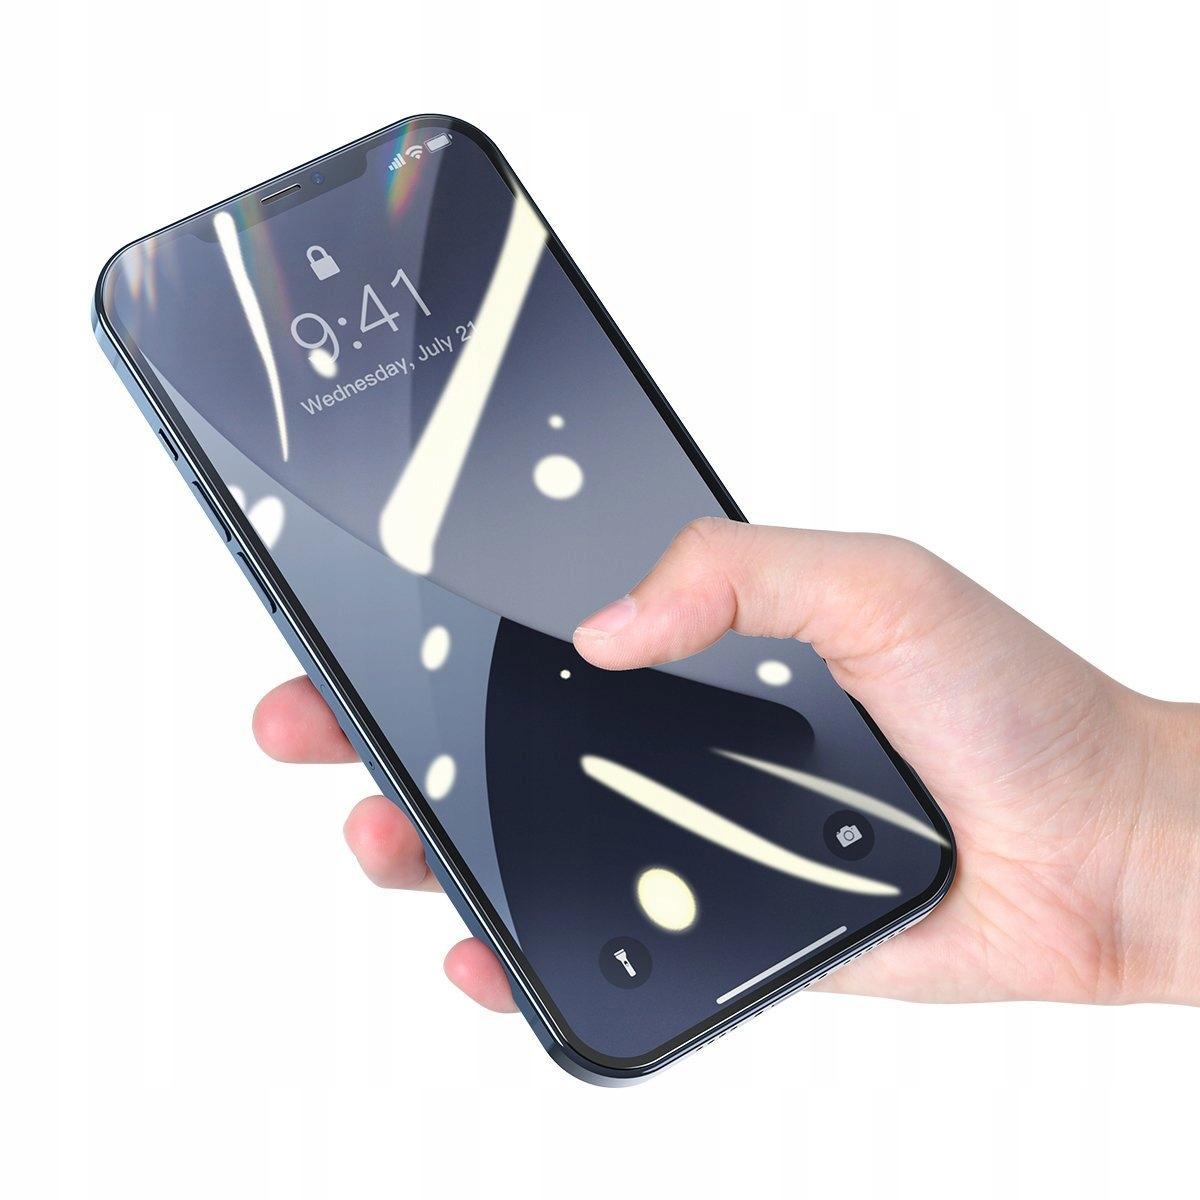 Baseus Szkło hartowane do iPhone 12 / 12 Pro 6.1 Kod producenta 6953156229099